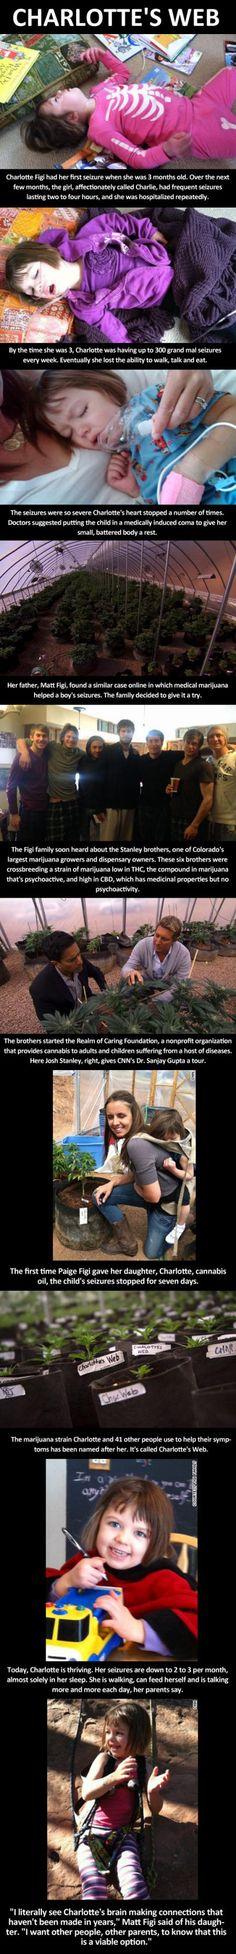 What Happens When This Little Girl Gives Marijuana A Try... #marijuana #seizure